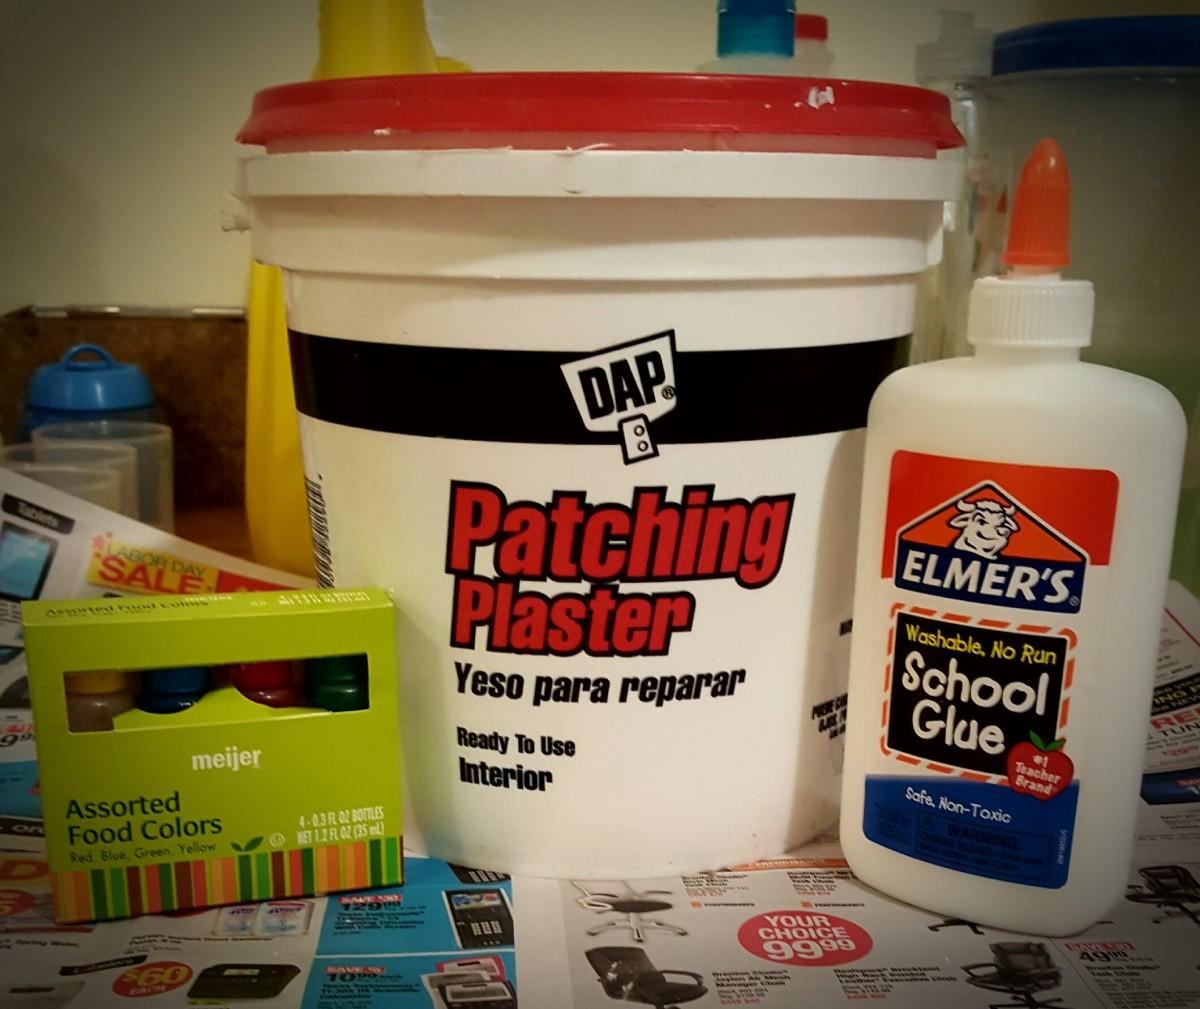 Plaster mixture ingredients.